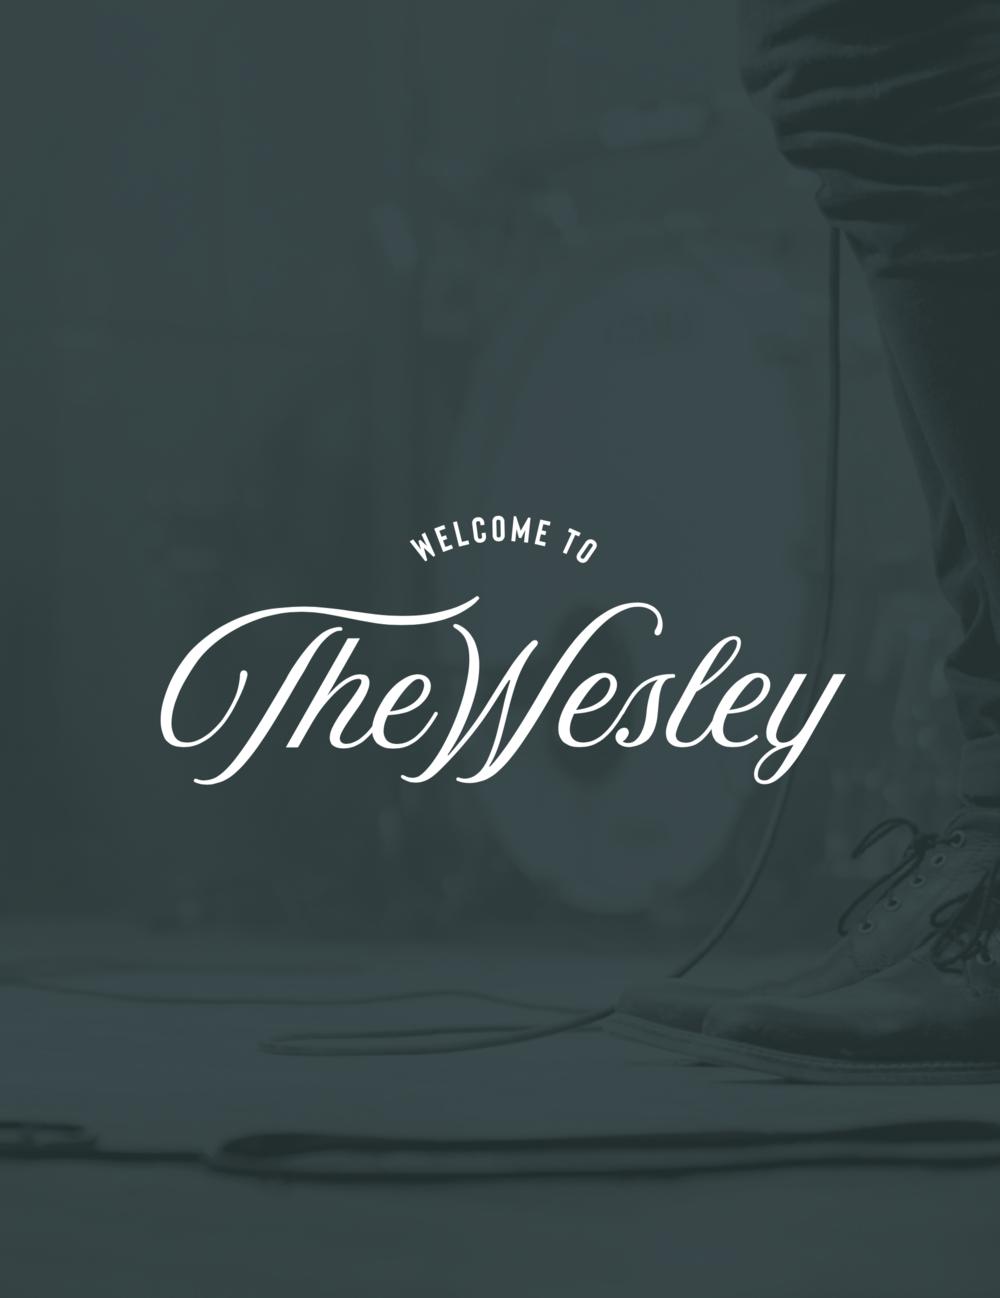 Flourish-Collaborative-Branding-Agency-Starland-Village-Savannah-The-Wesley-Logo1.png